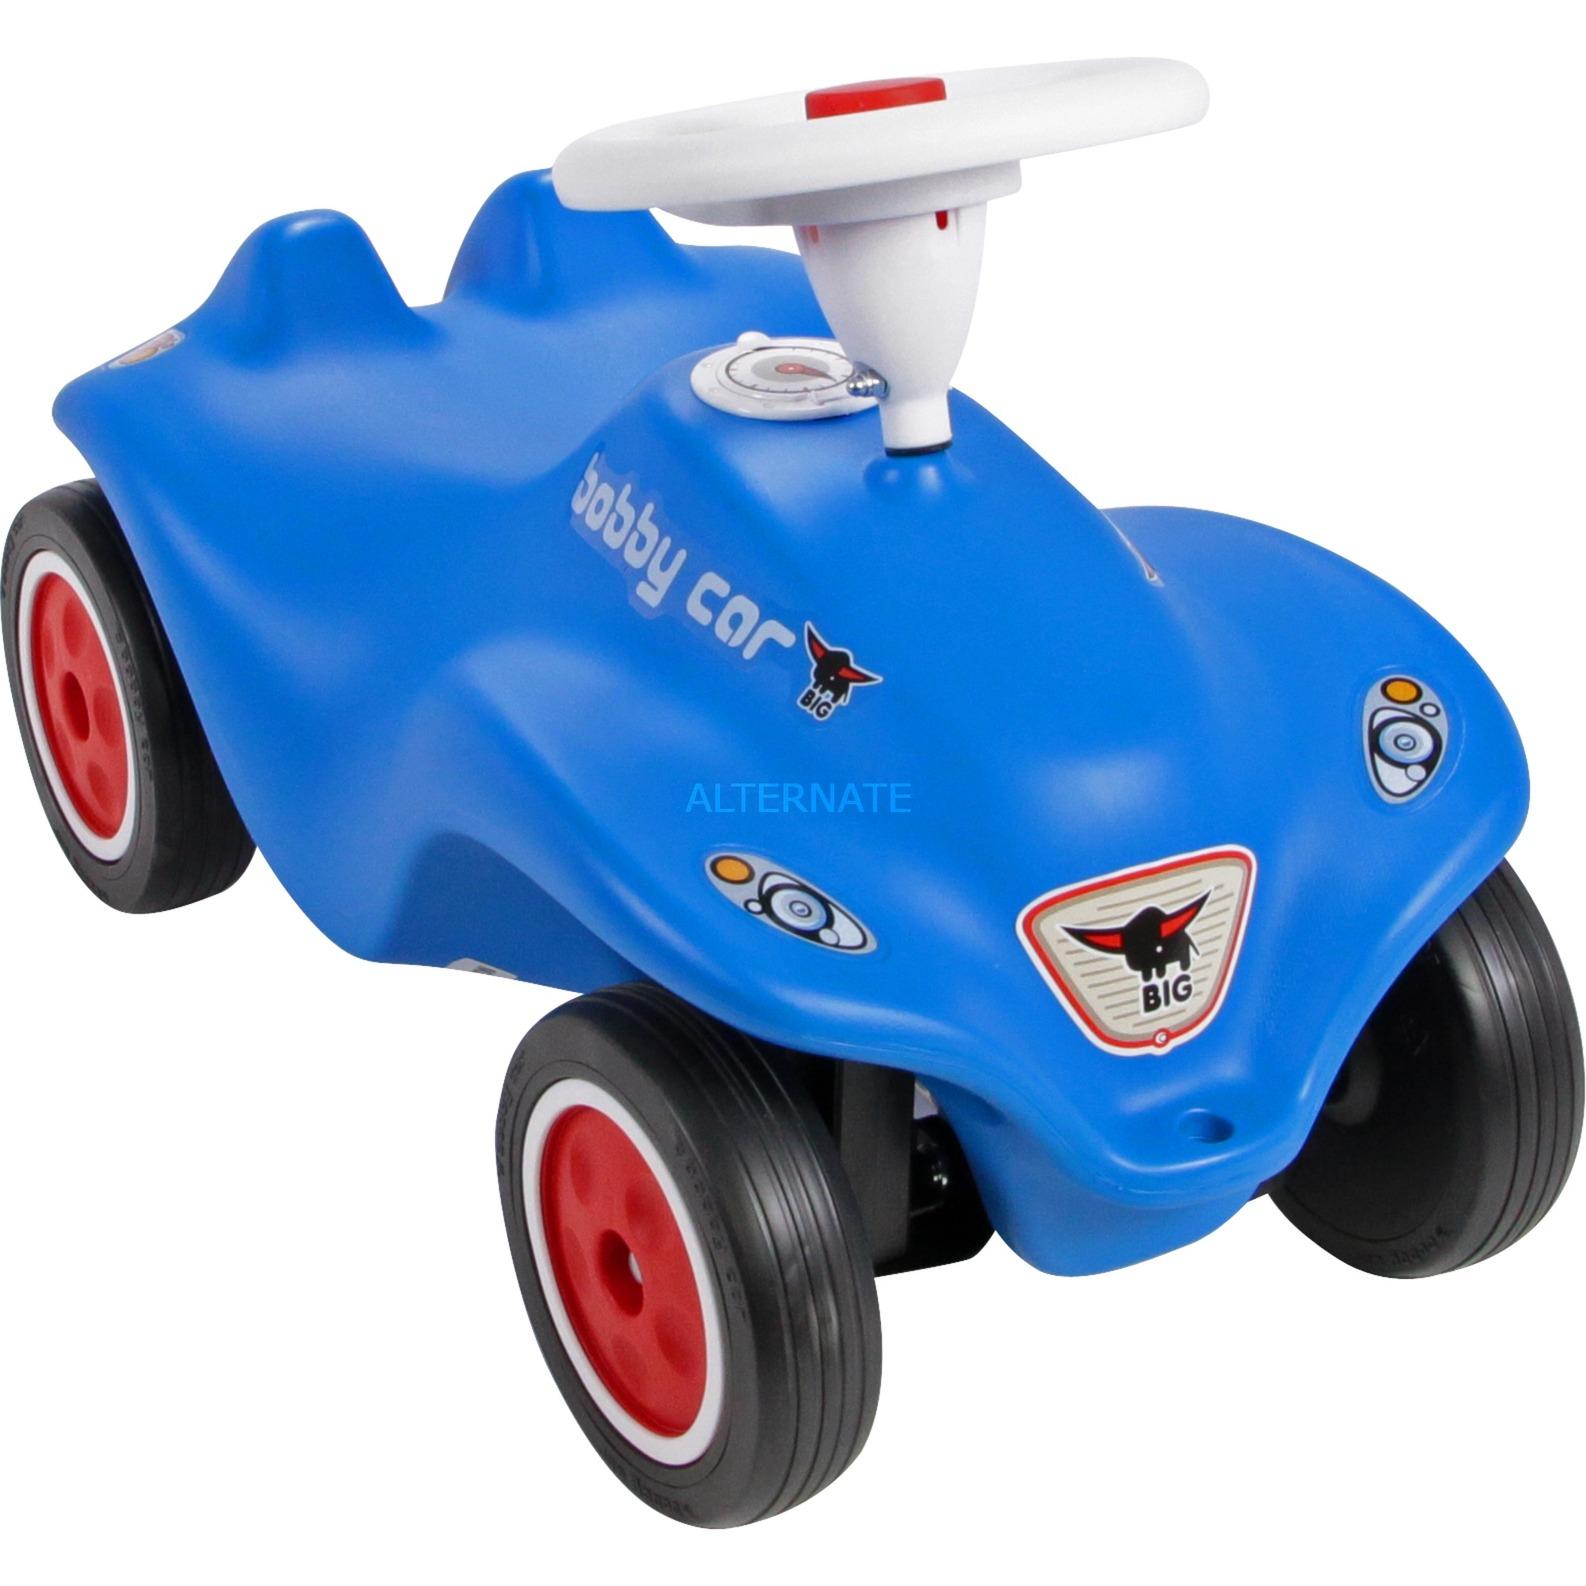 new-bobby-car-blau-born-koretoj